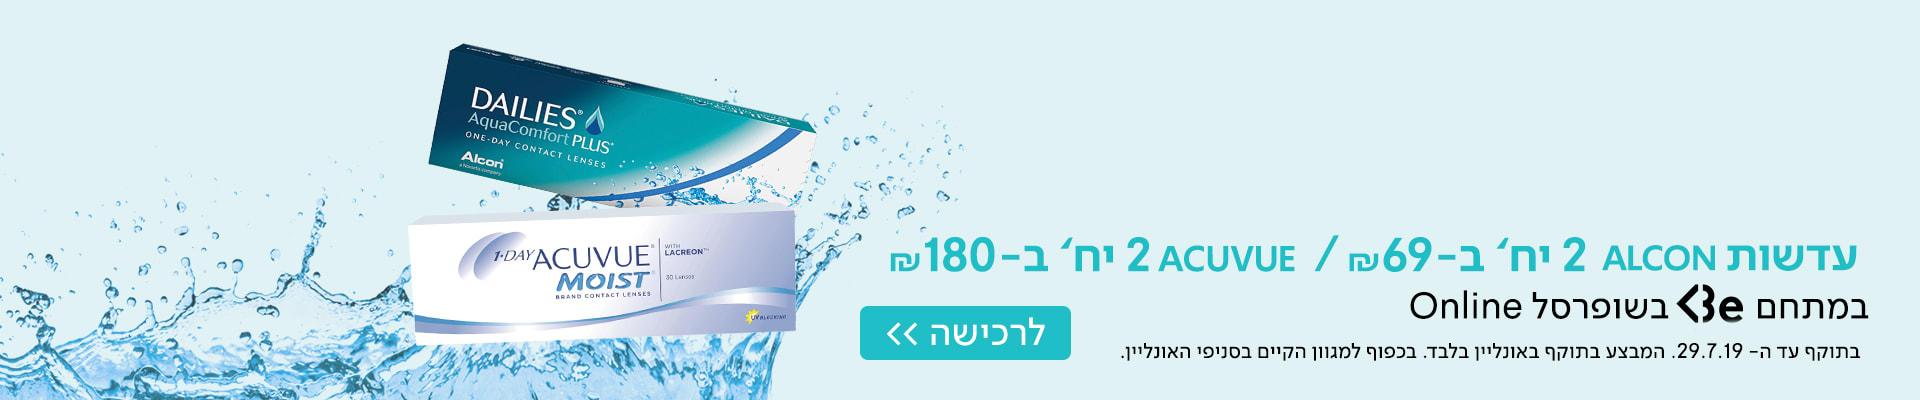 BE_july_campaign_site_1920x400_E.jpg